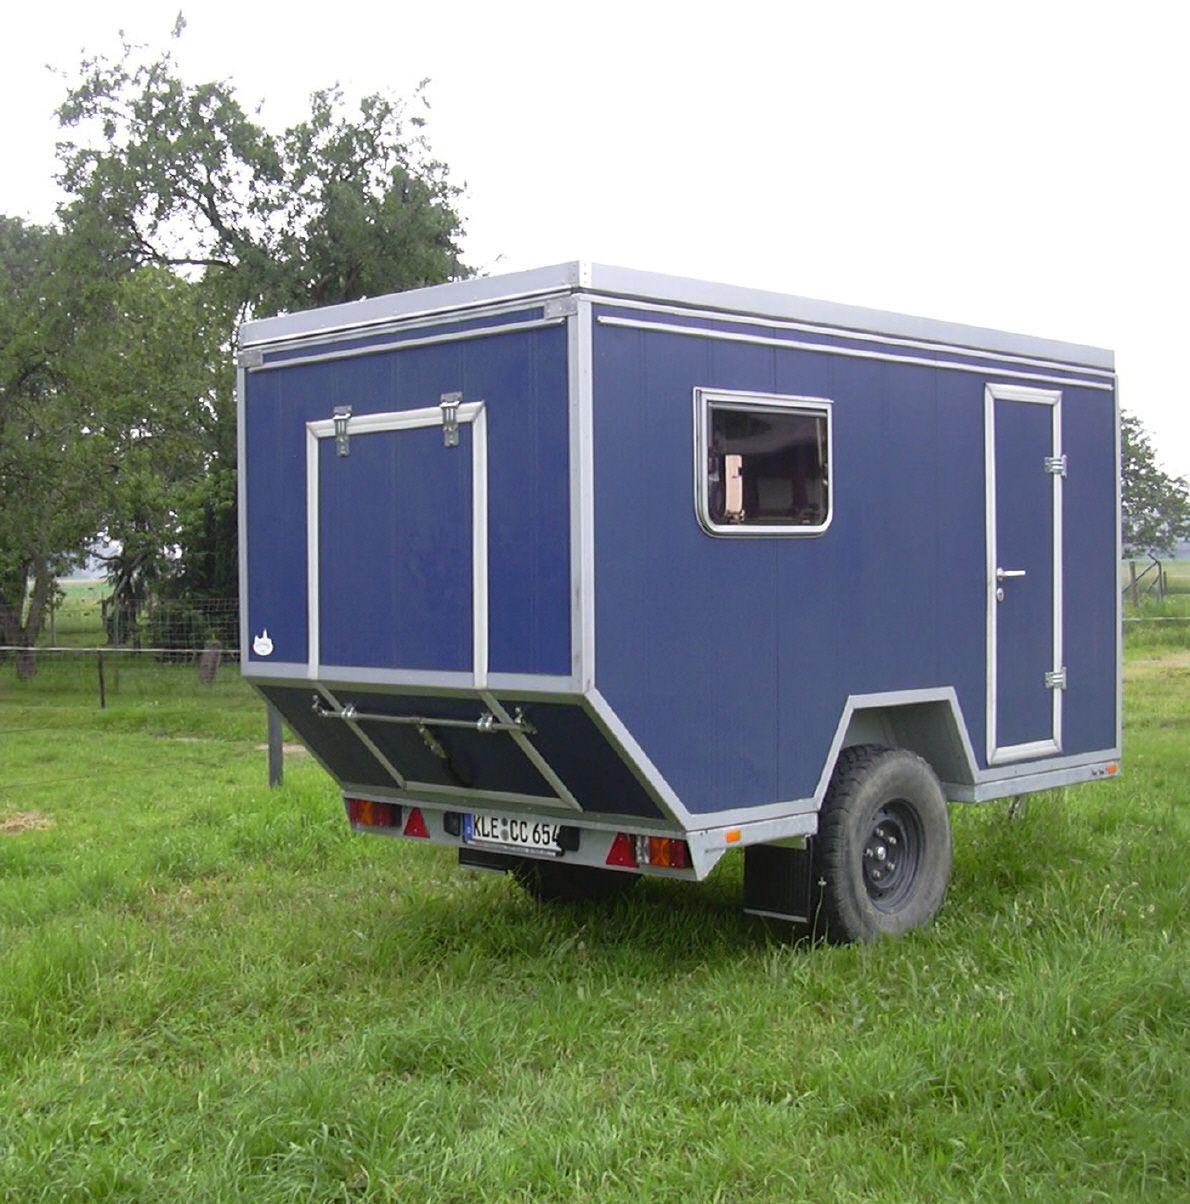 HymerEriba Triton Wohnwagen Eriba Triton Pinterest